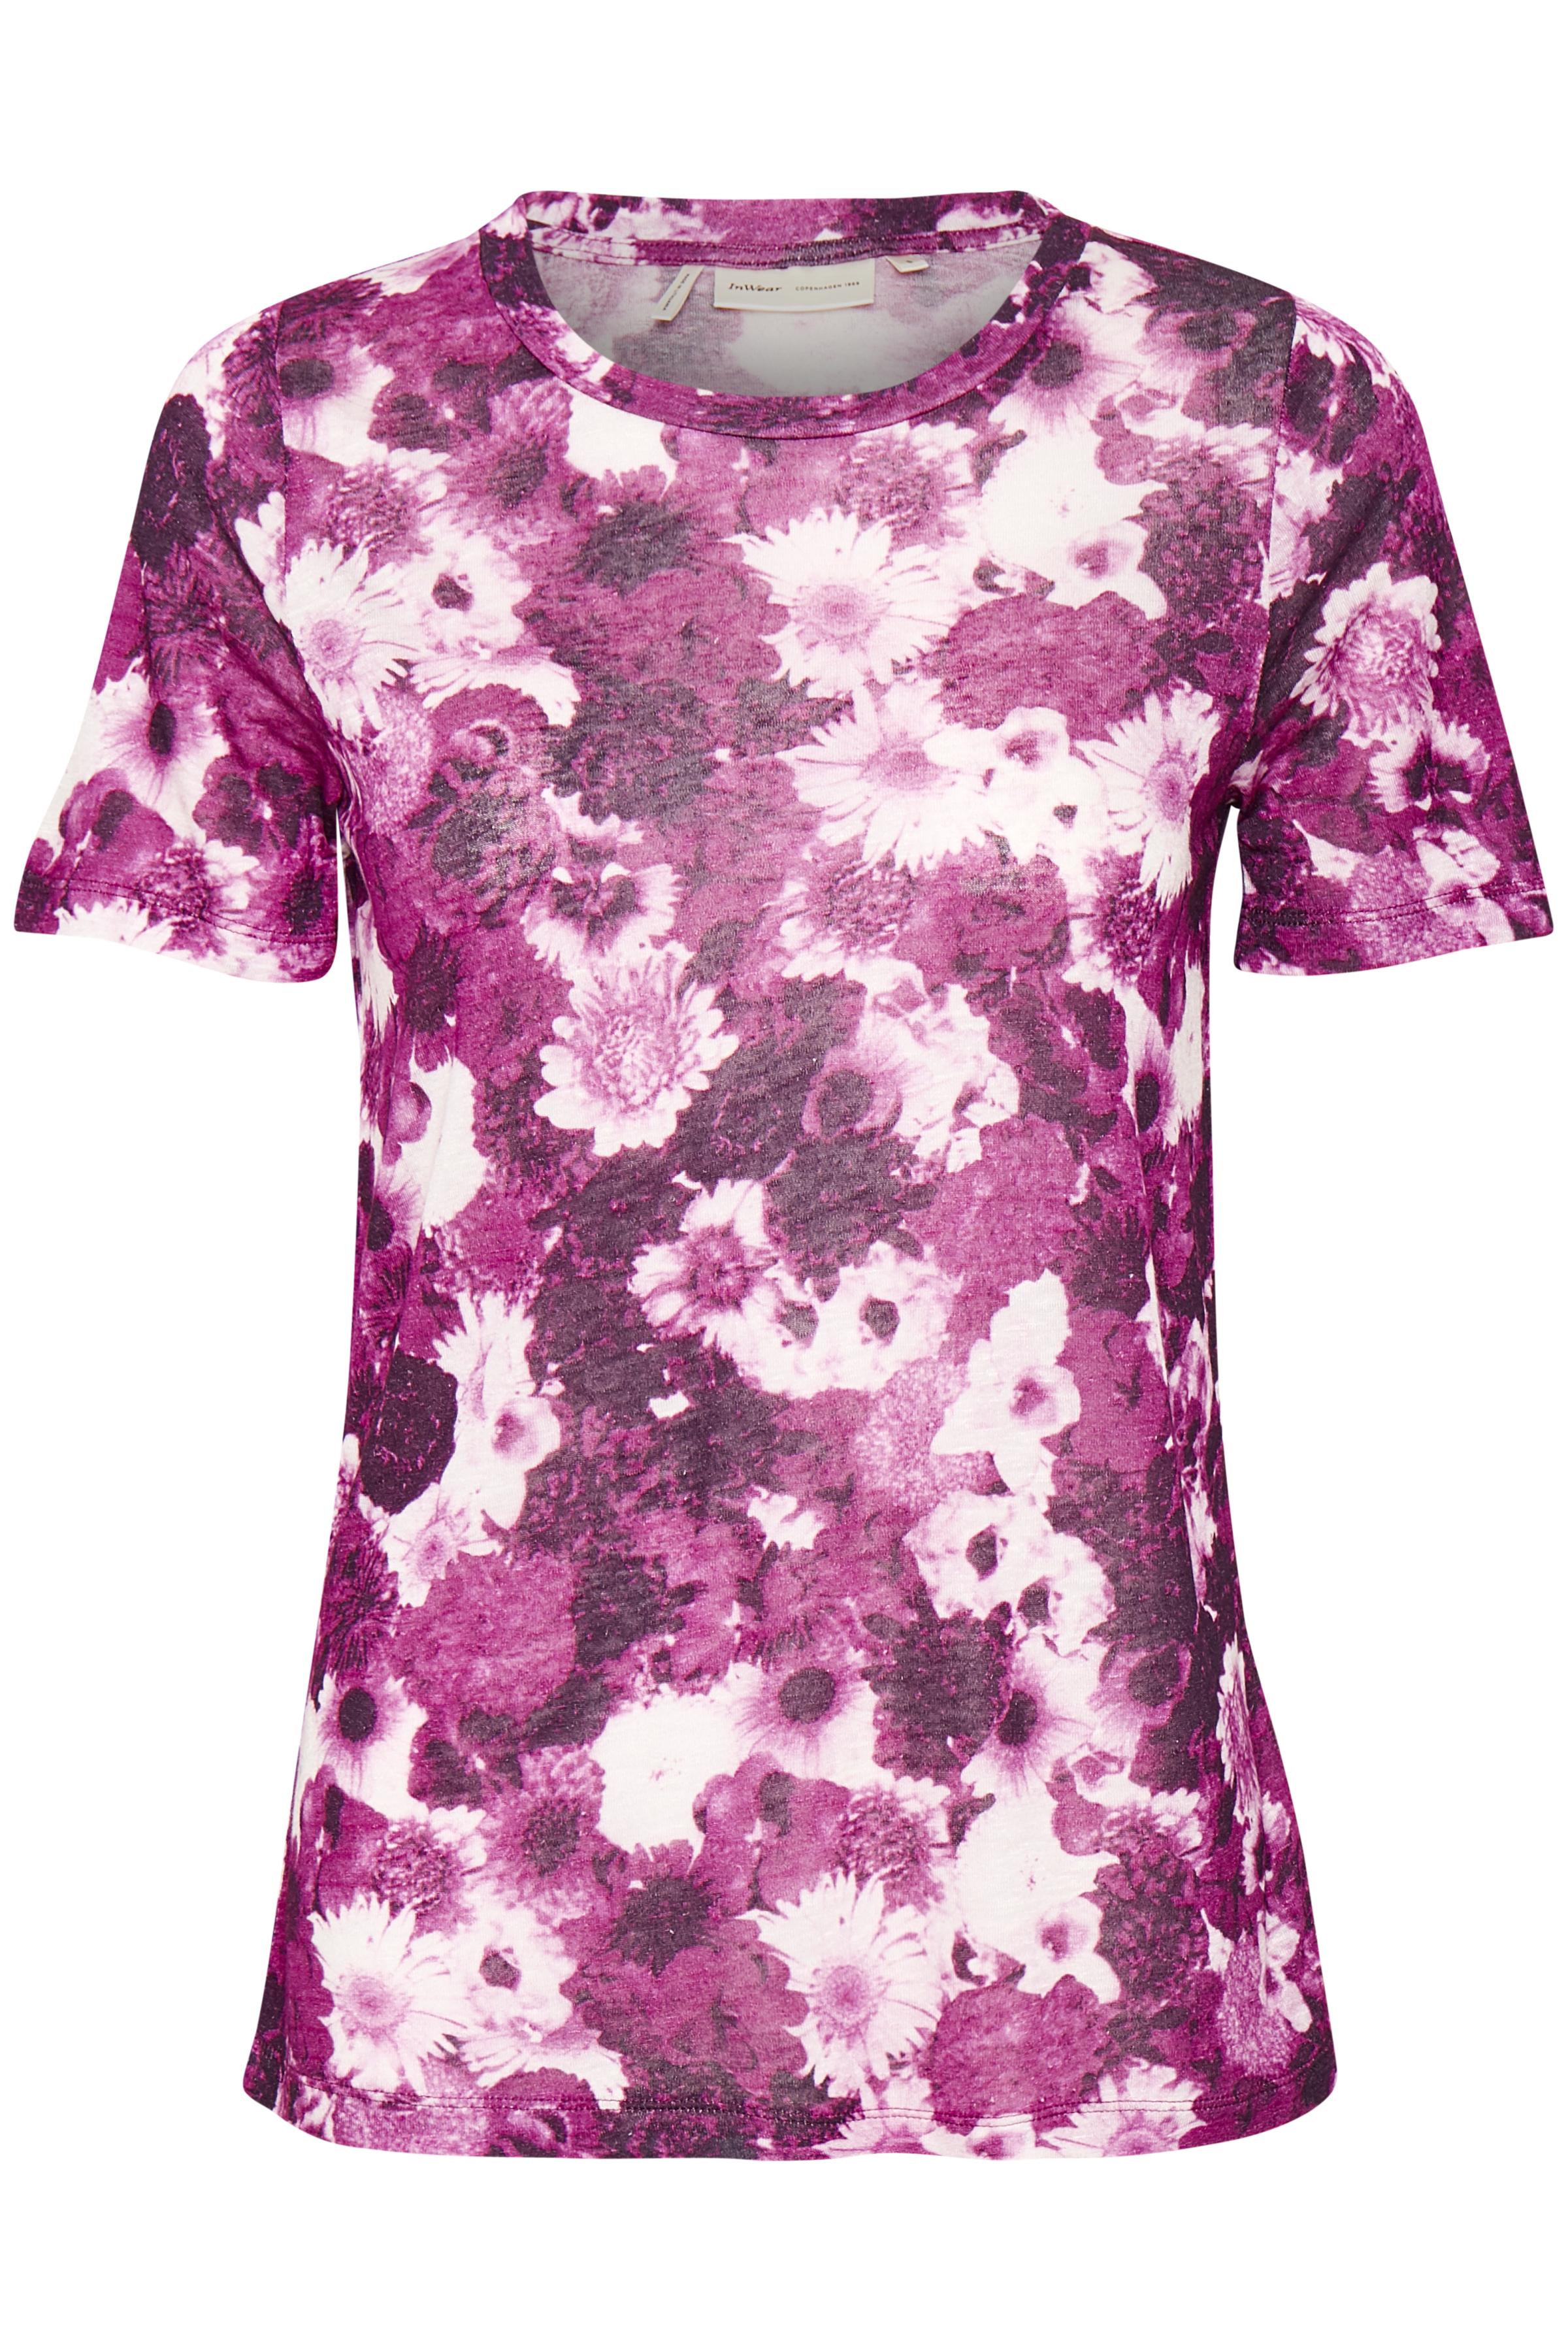 Cerise Pink Flower Collage